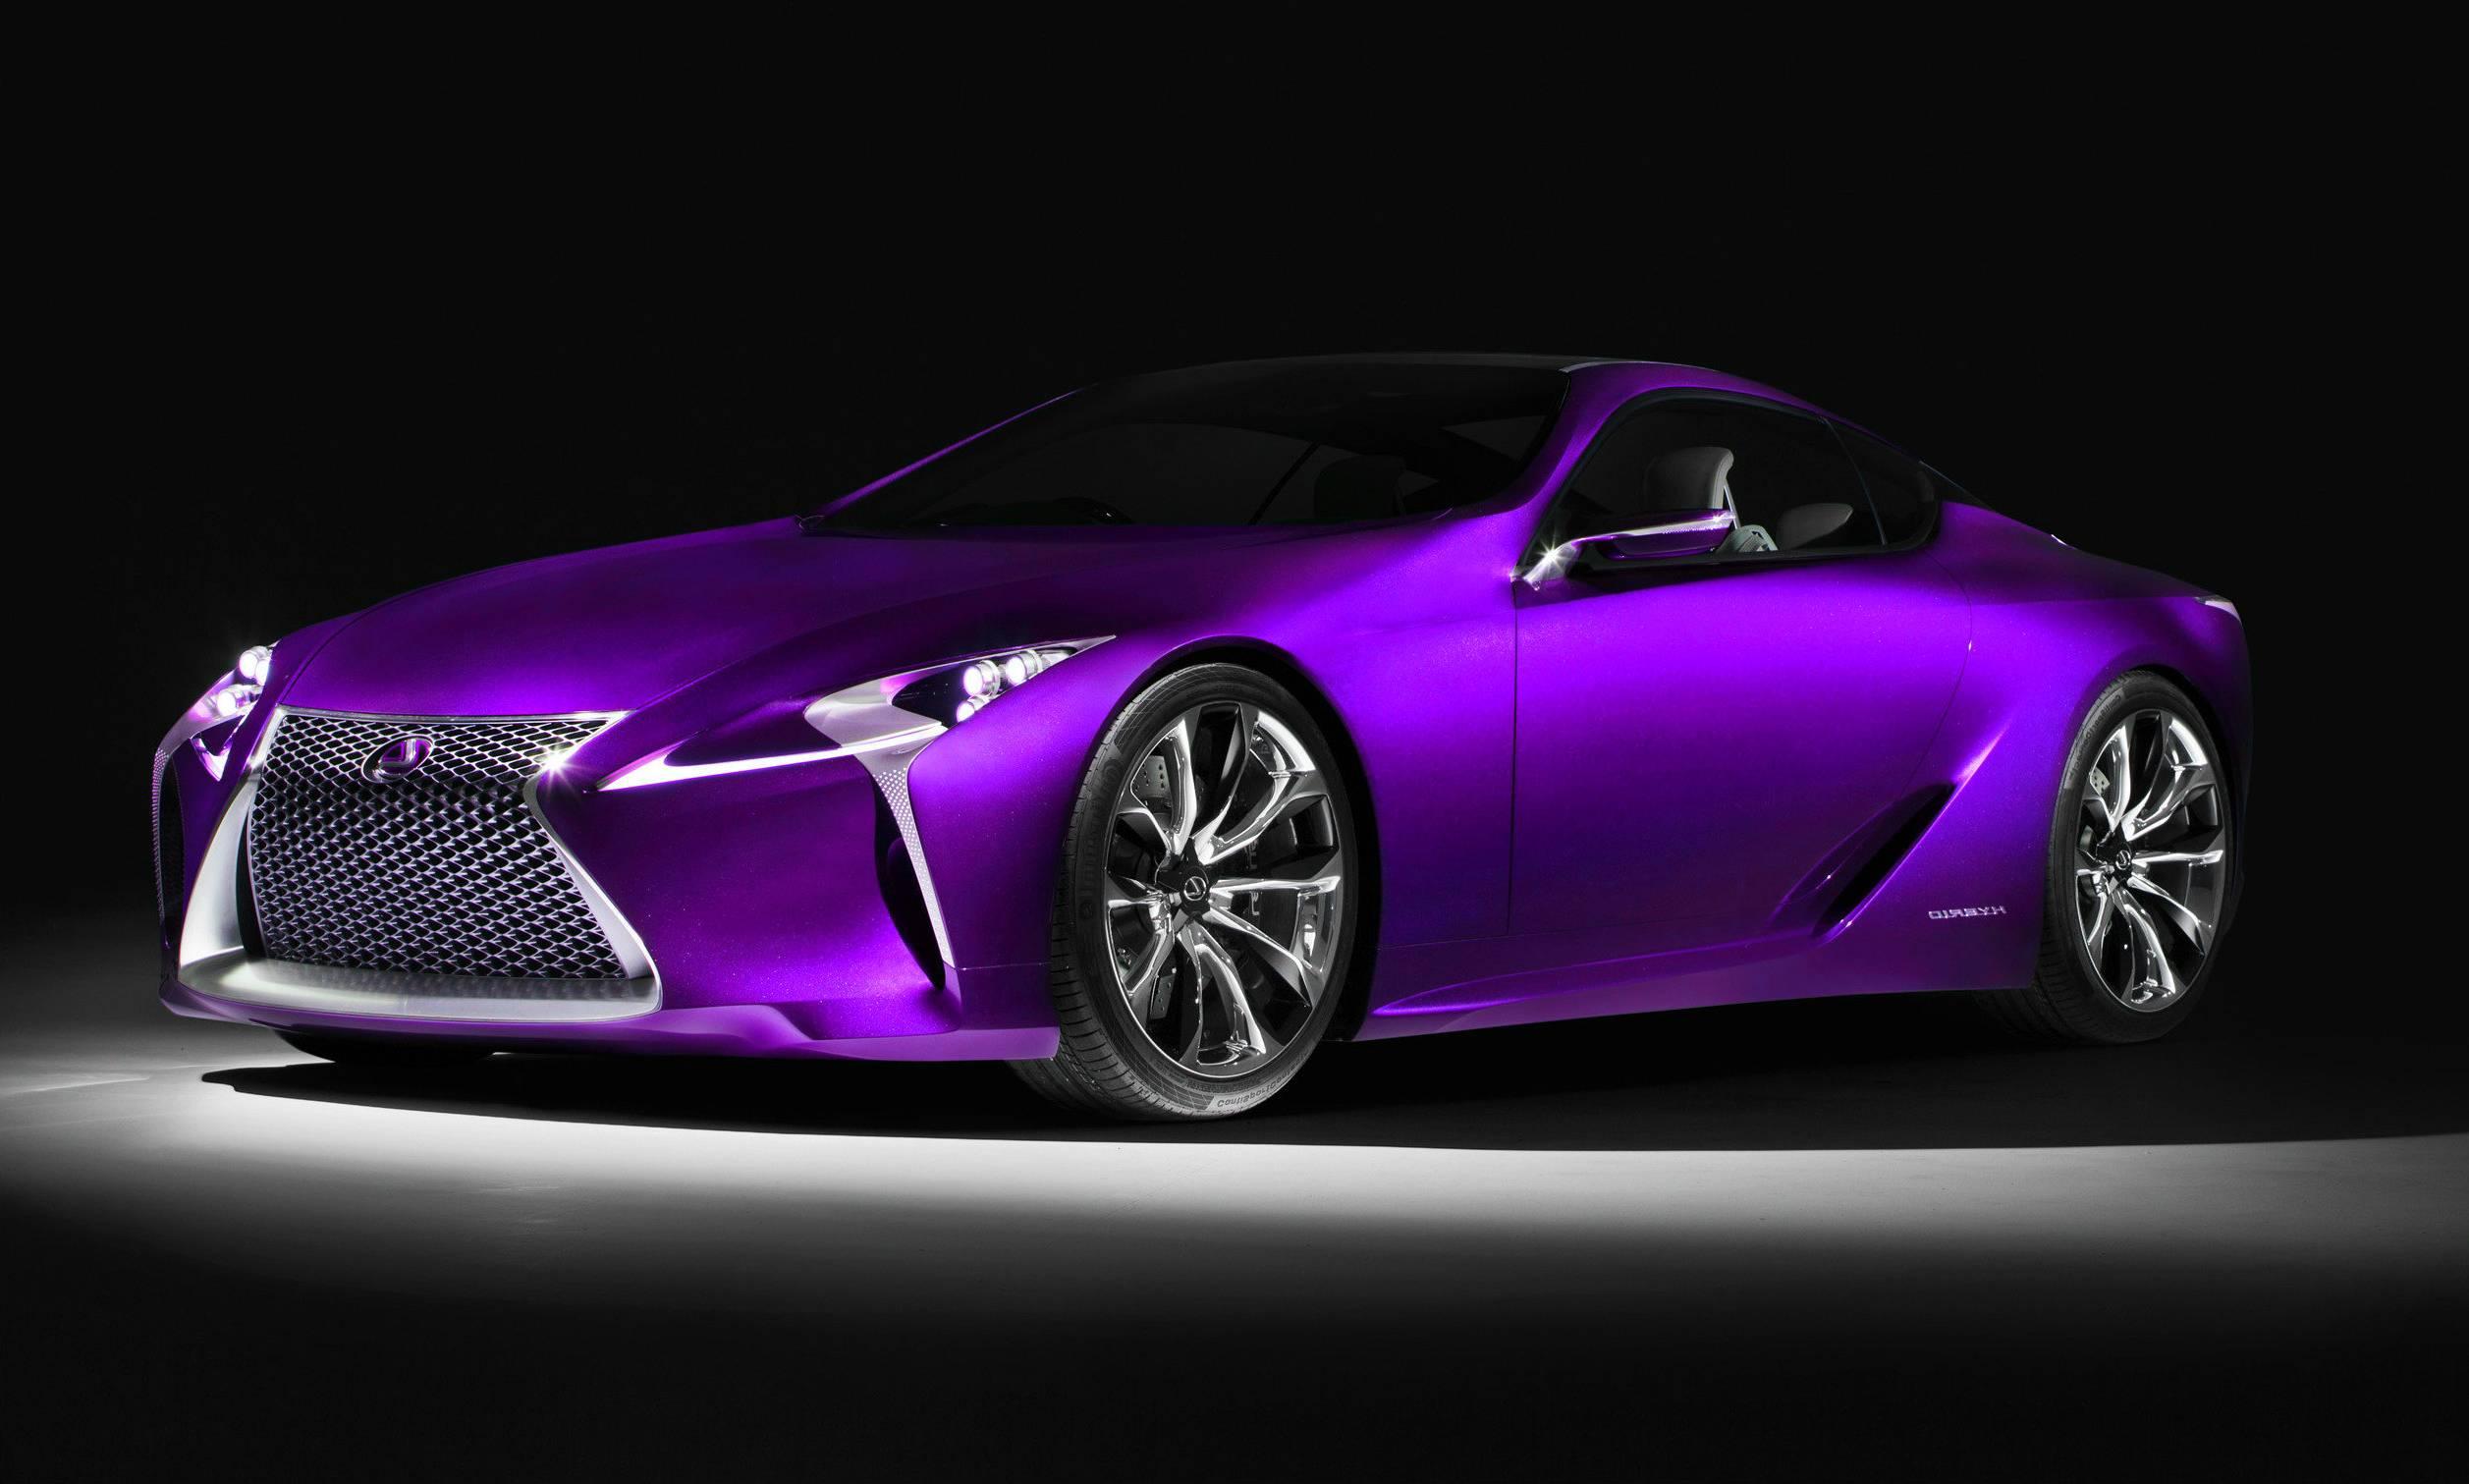 Purple Car Hd Wallpaper Background Image 2514x1511 Id 686599